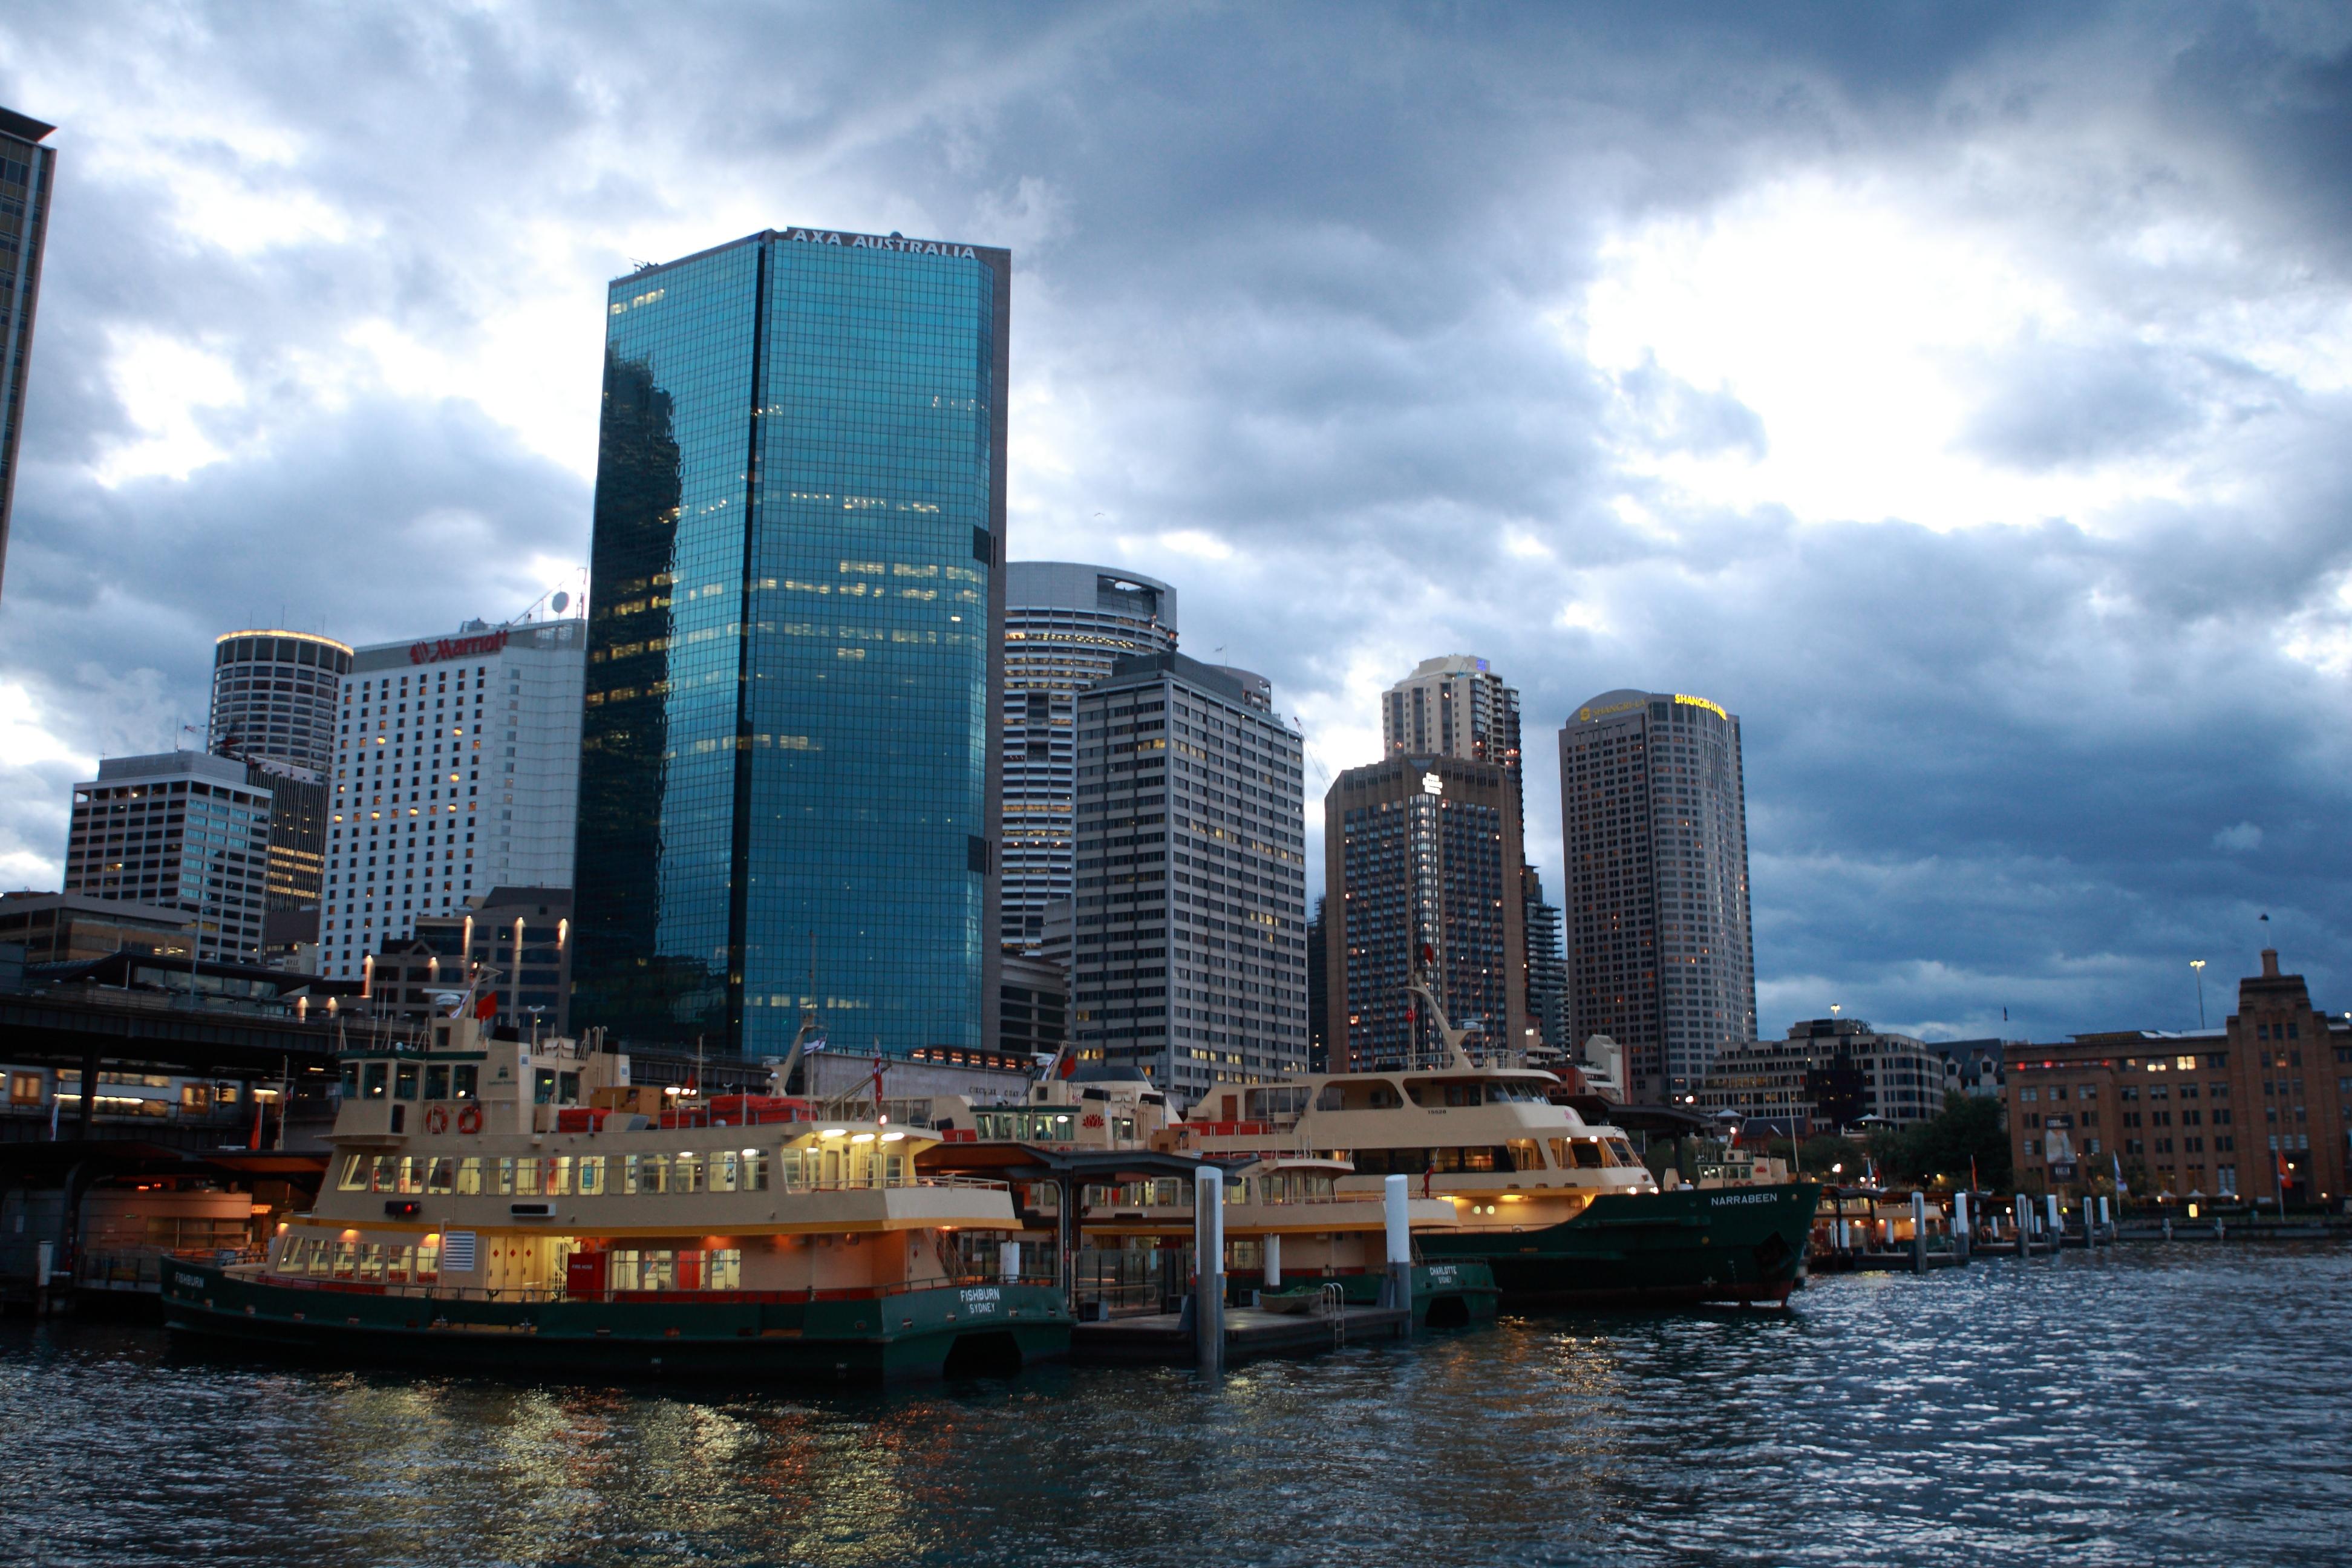 Australia_Sydney_36